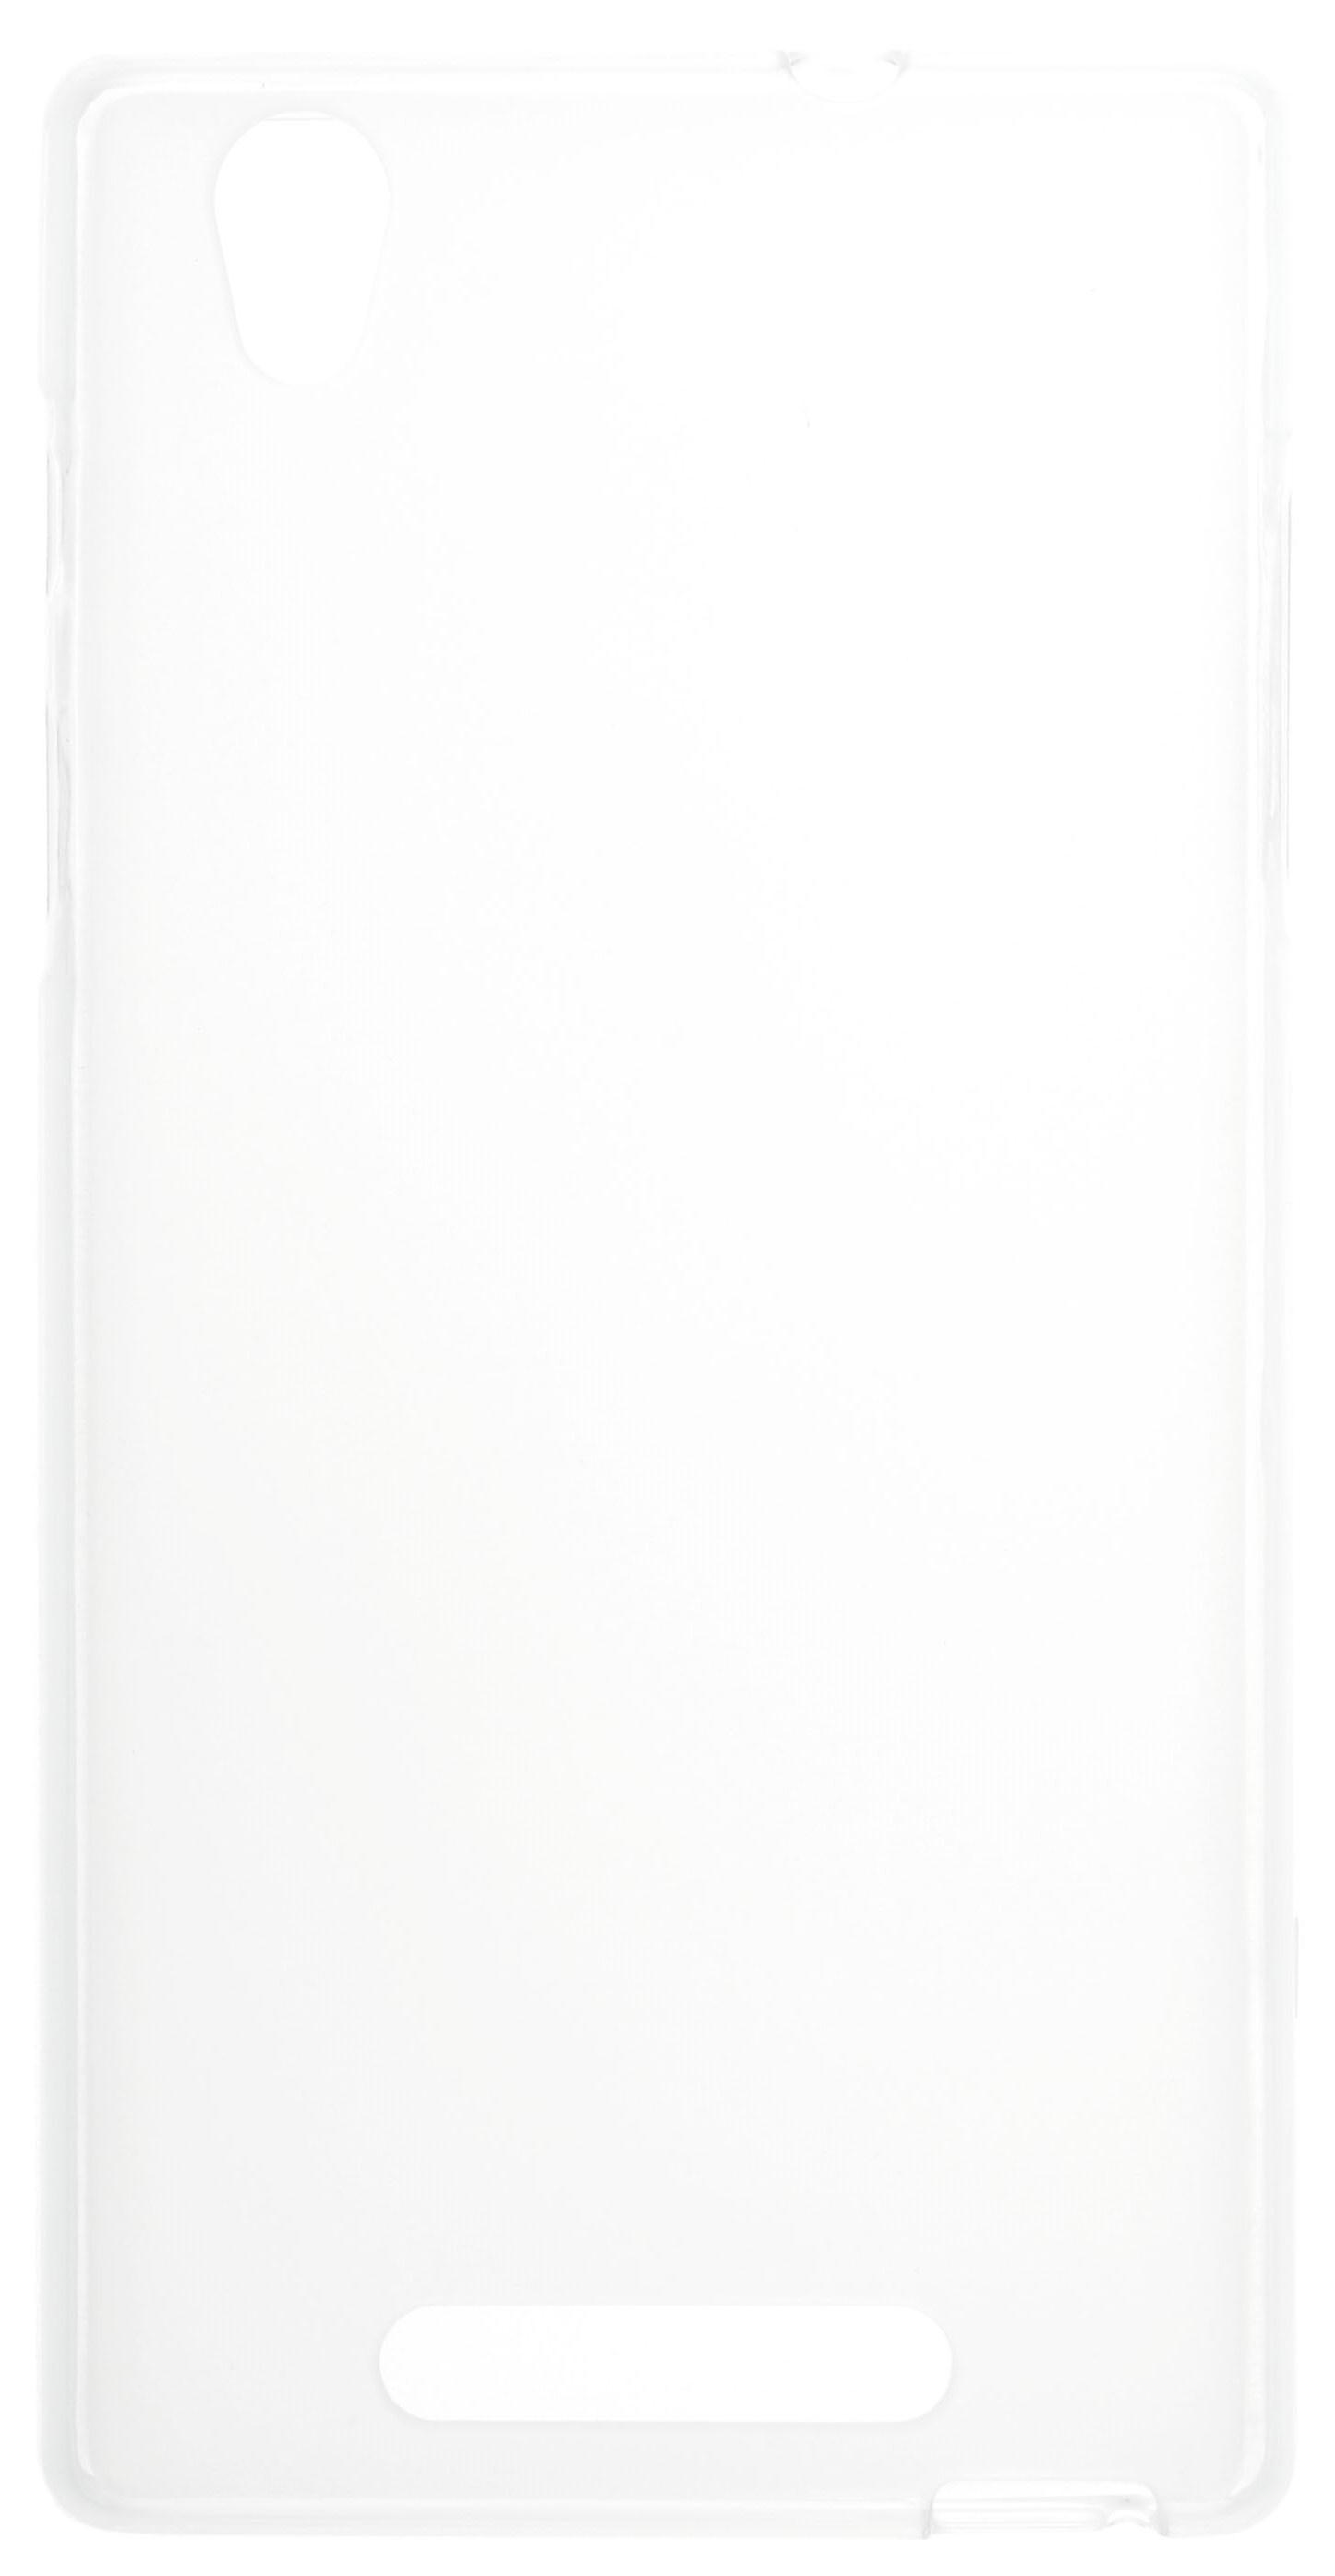 Чехол для сотового телефона skinBOX Silicone, 4660041407204, прозрачный аксессуар чехол skinbox для philips v787 shield silicone transparent t s pv787 005